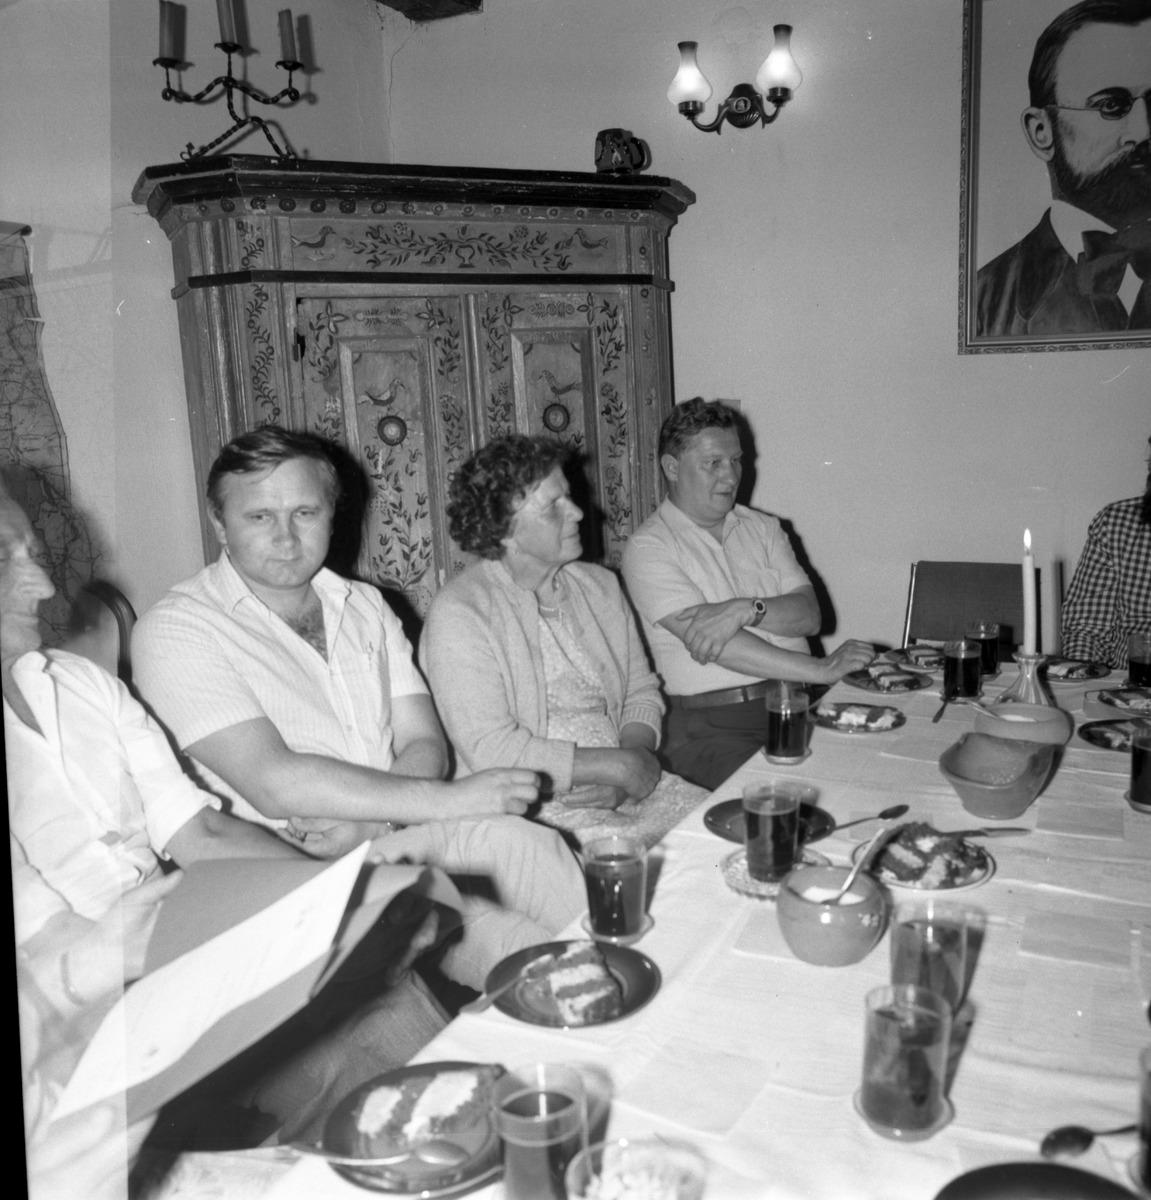 43-lecie TMZG, 1987 r.  [3]